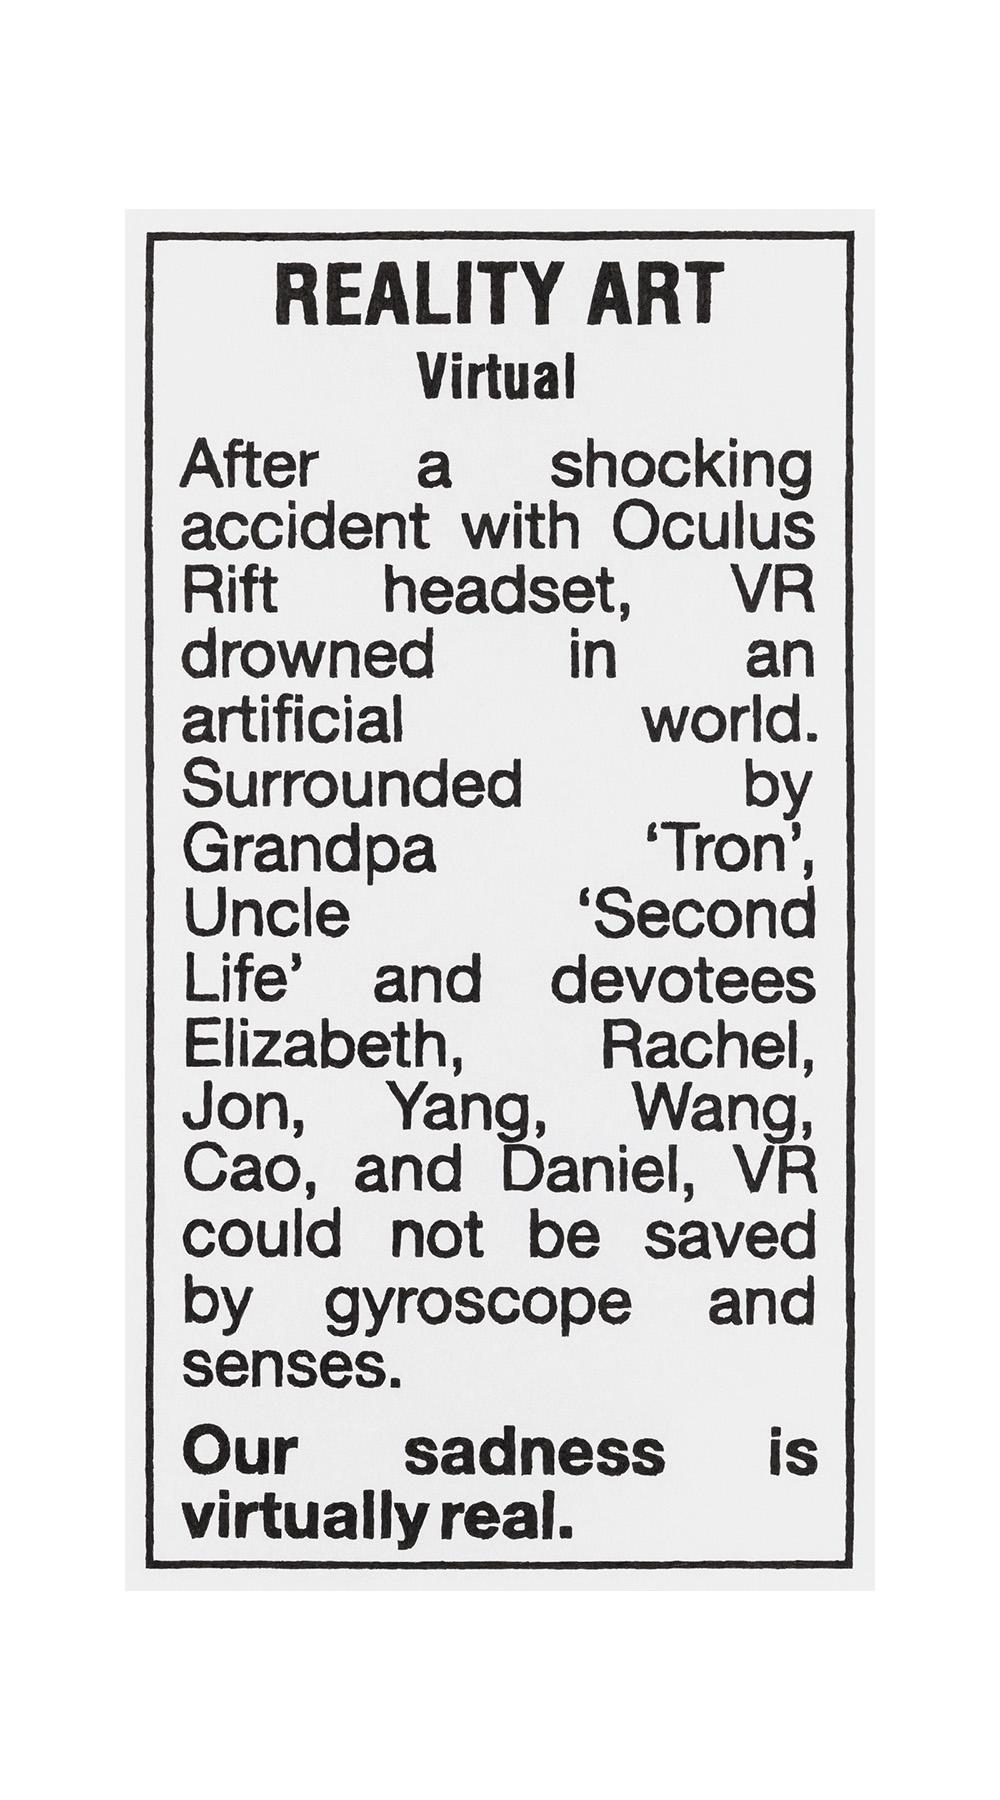 REALITY ART, Virtual 2018